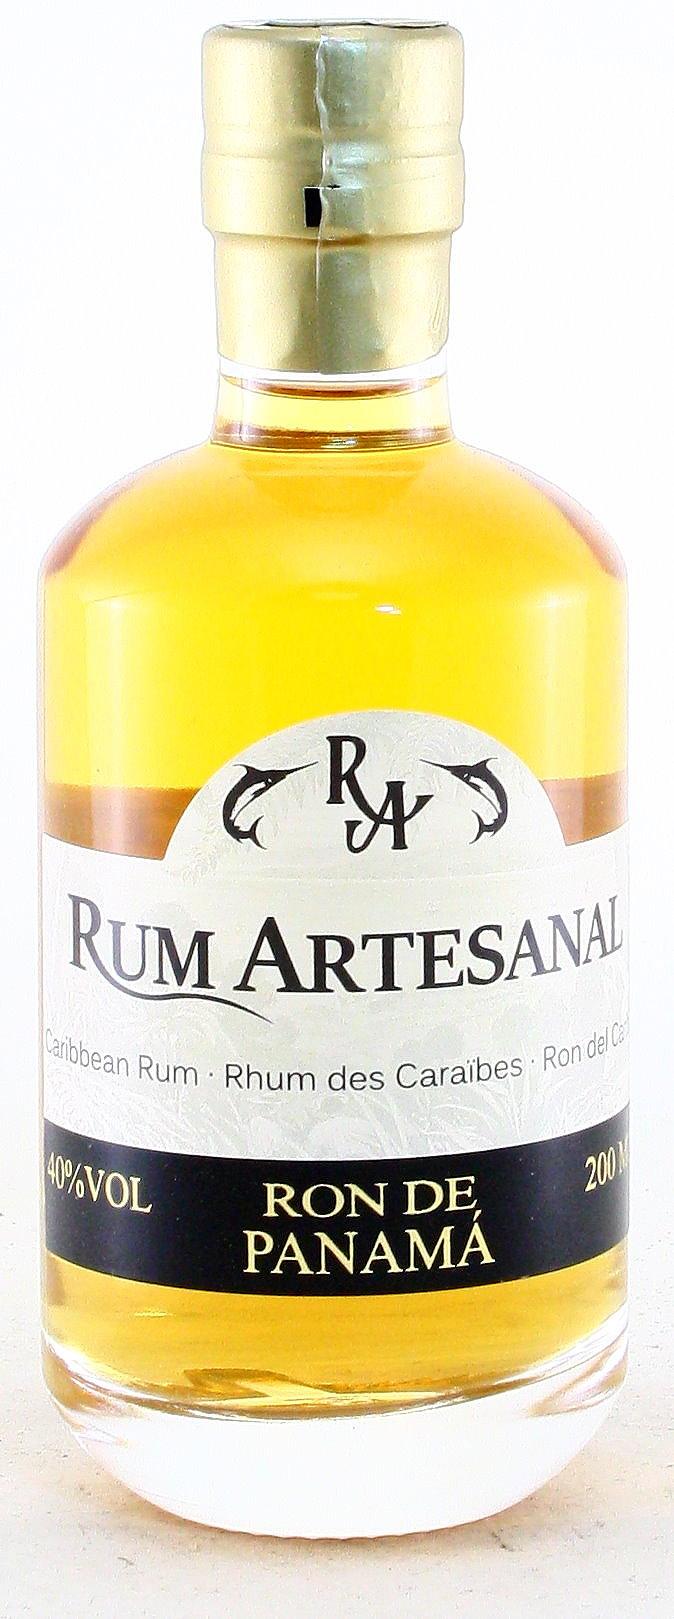 200 ml Ron de Panama, Rum Artesanal Panama